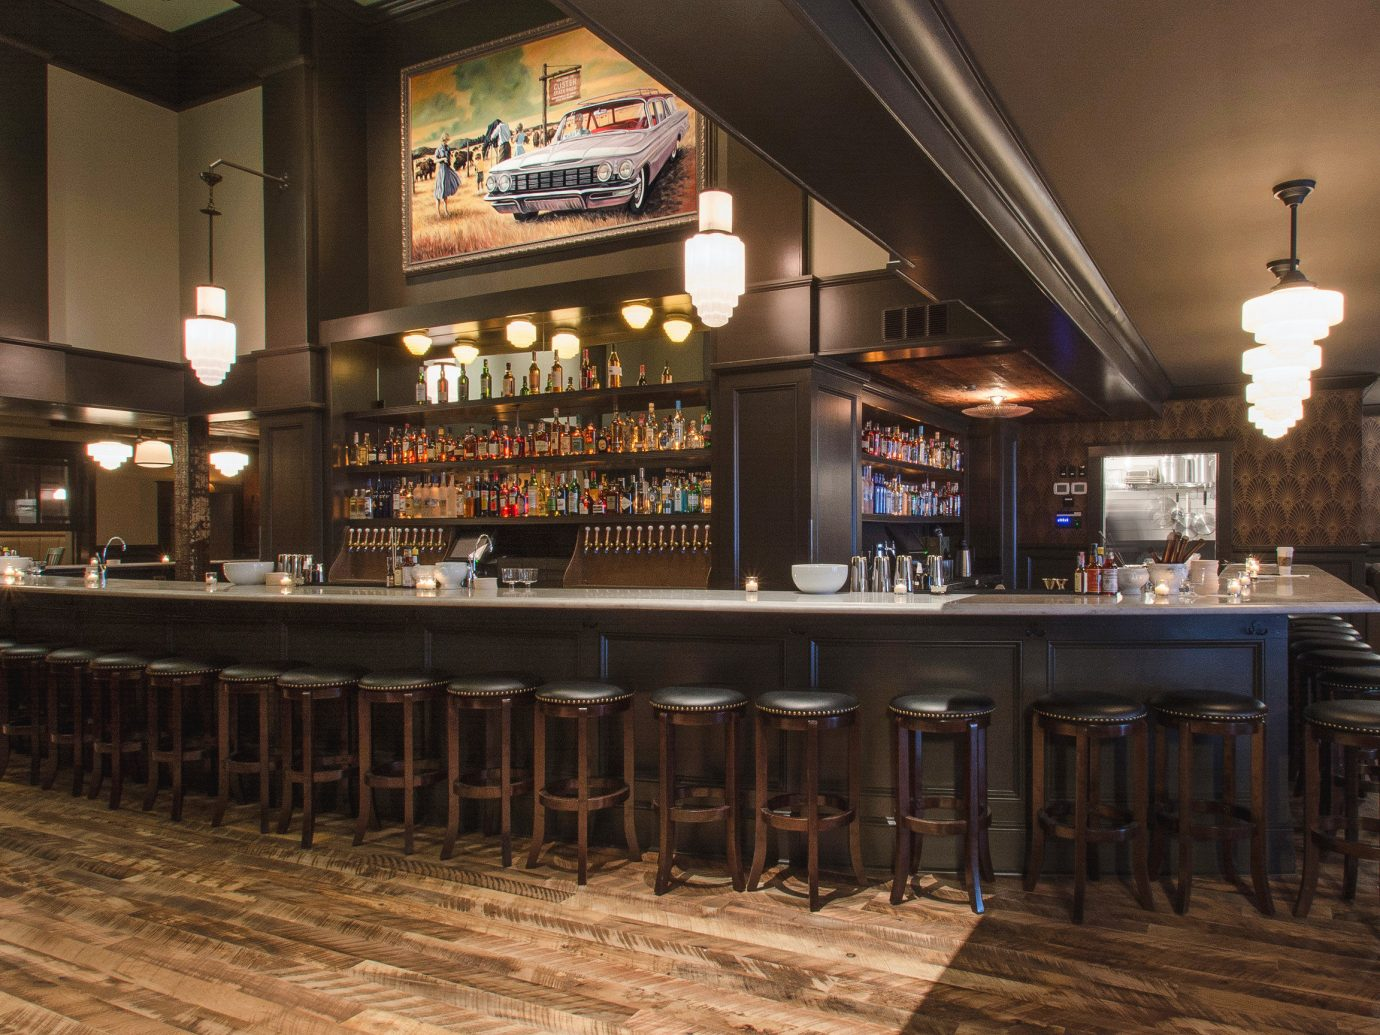 Boutique Hotels Hotels Luxury Travel indoor Bar restaurant interior design tavern pub café several